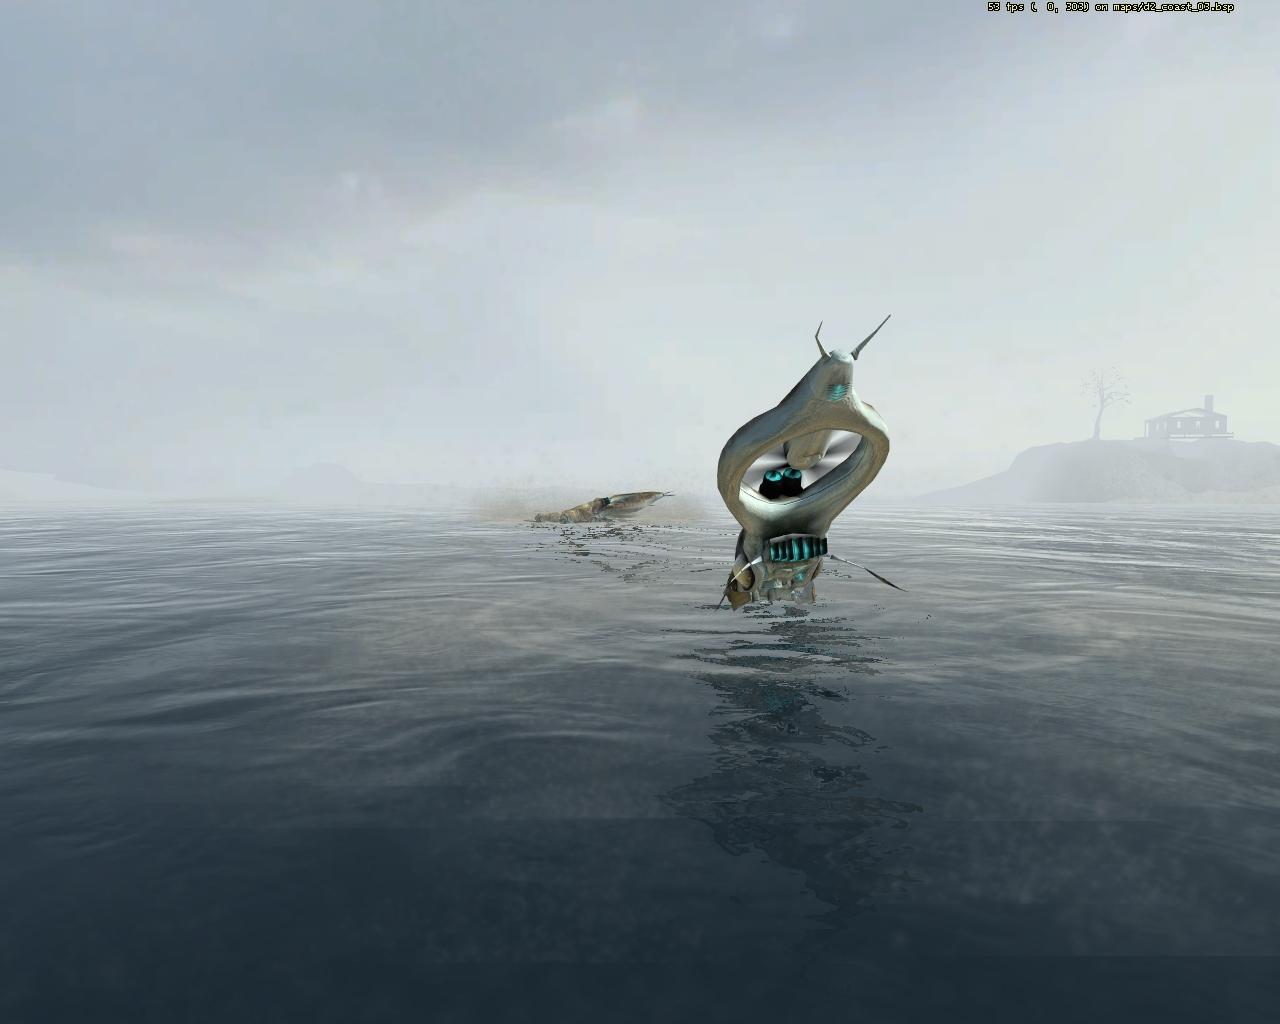 d2_coast_030067.jpg - Half-Life 2